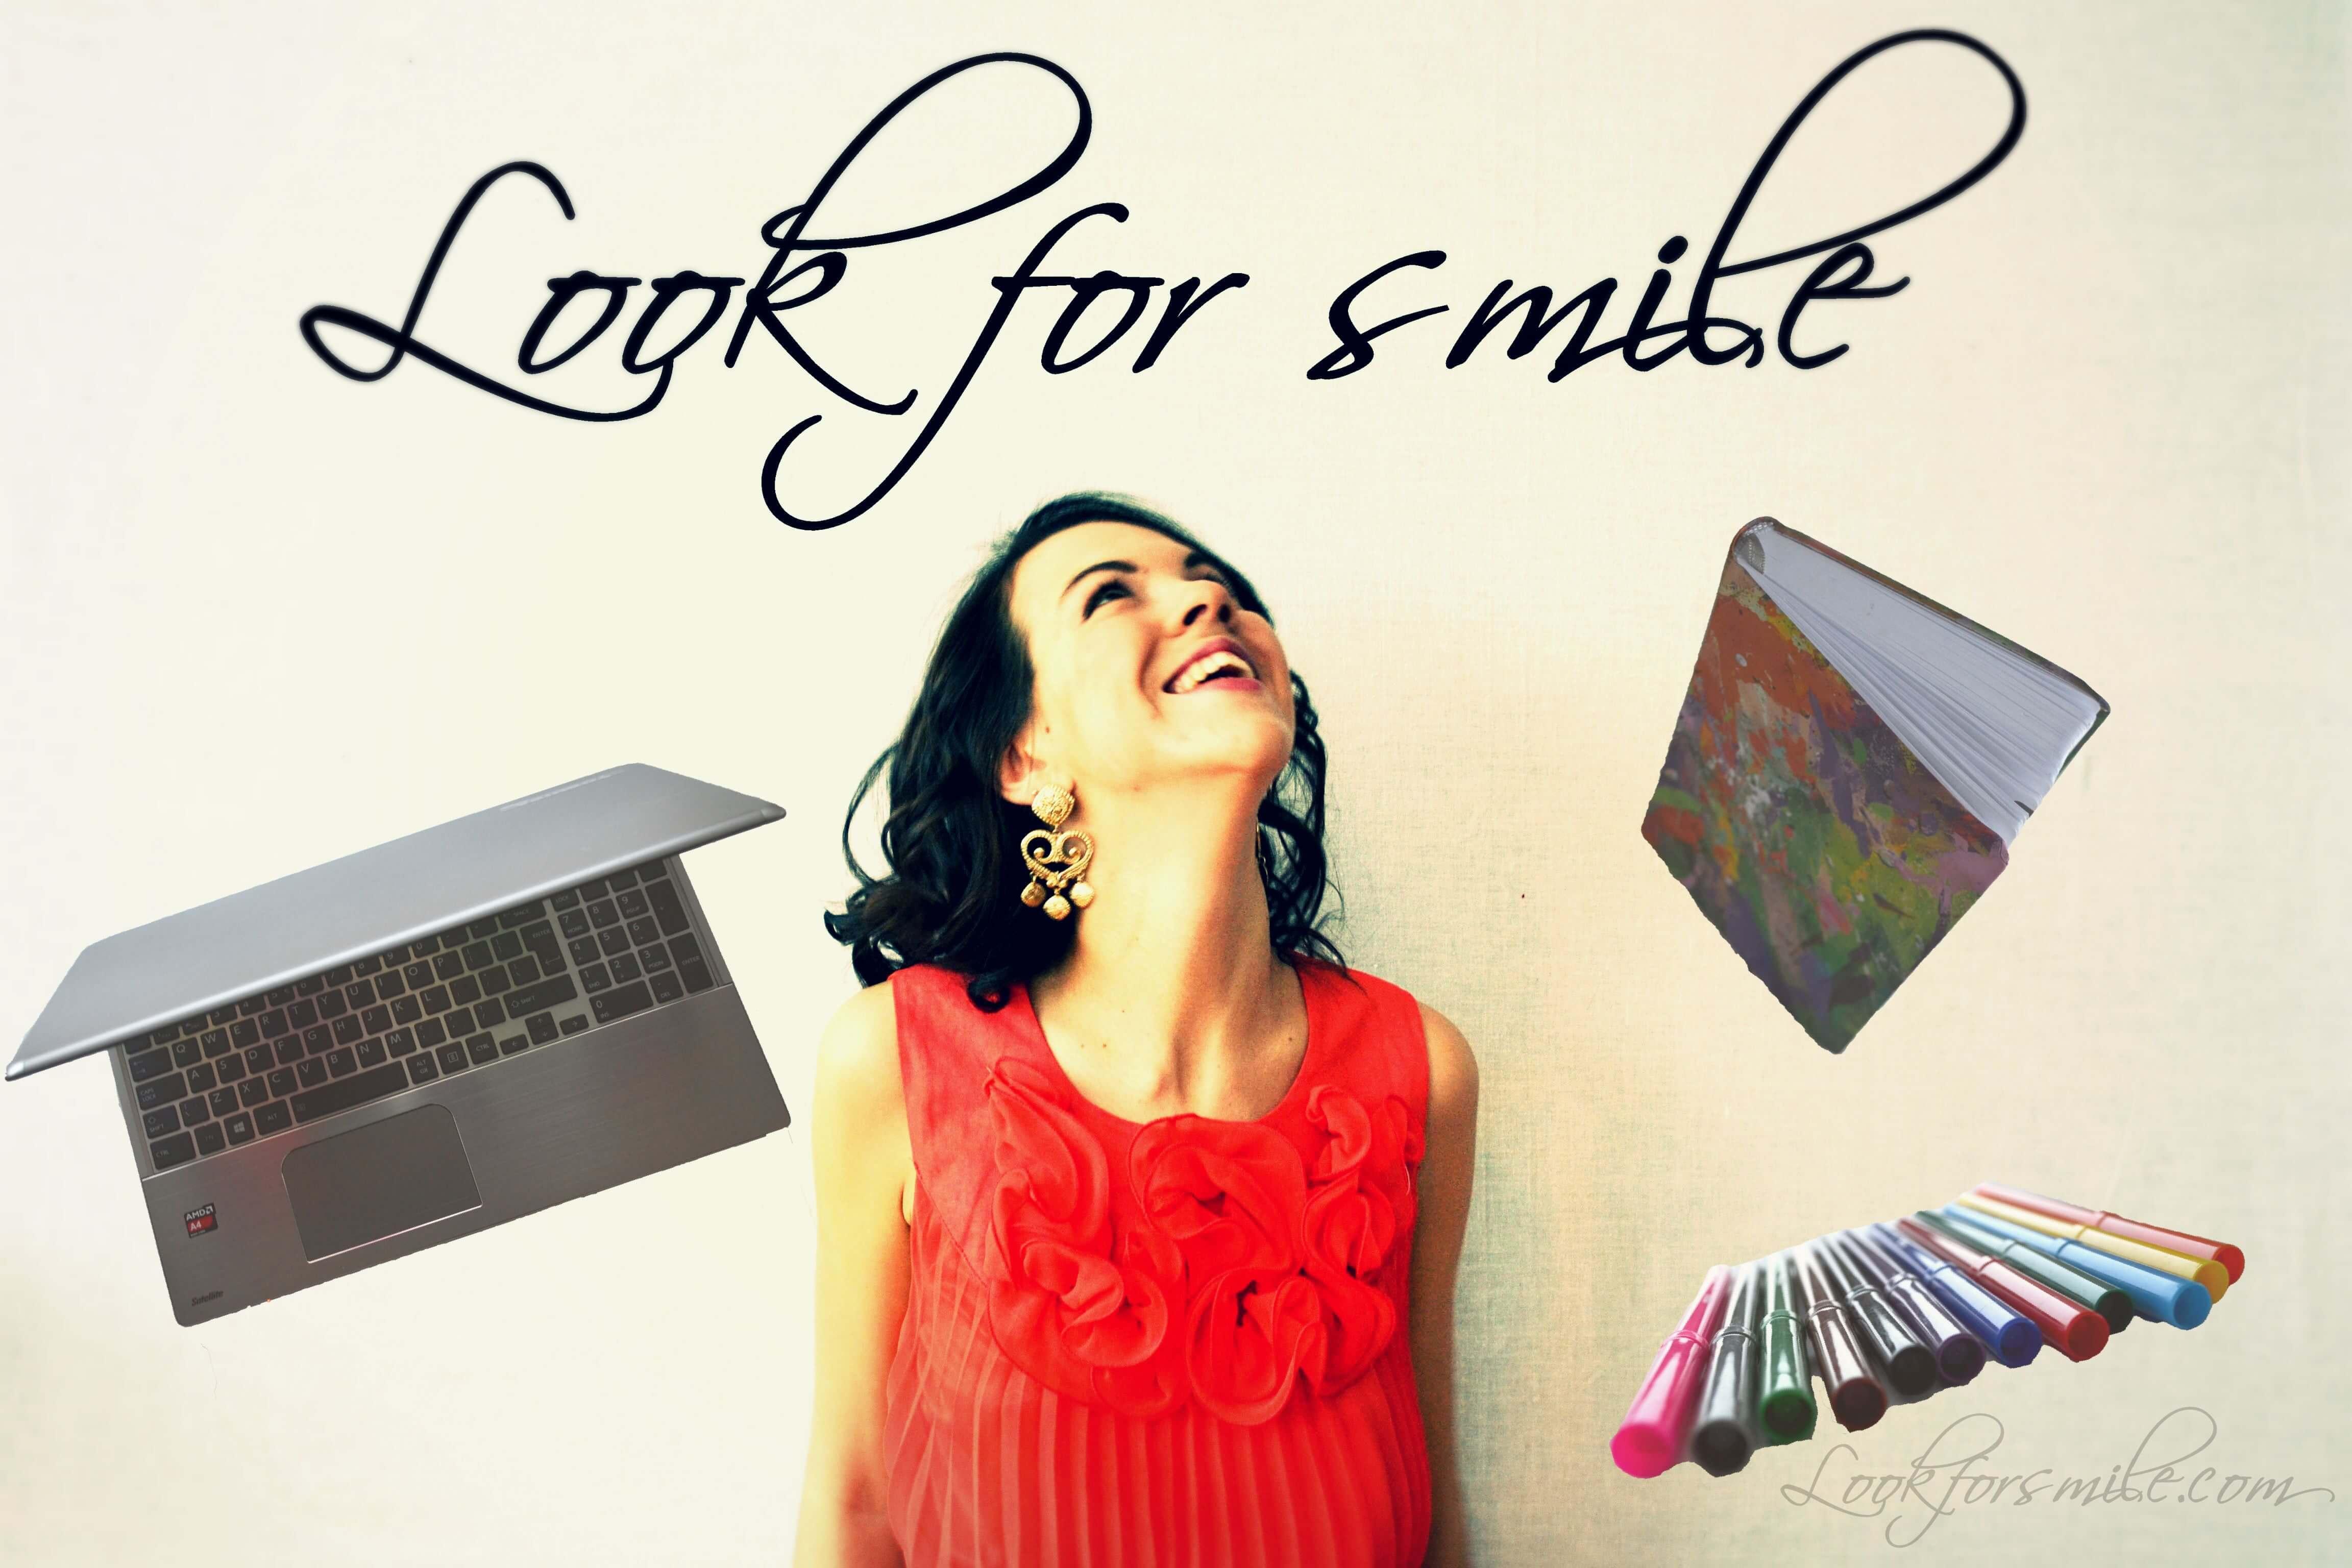 look for smile - dators, plānotājs, flomāsteri